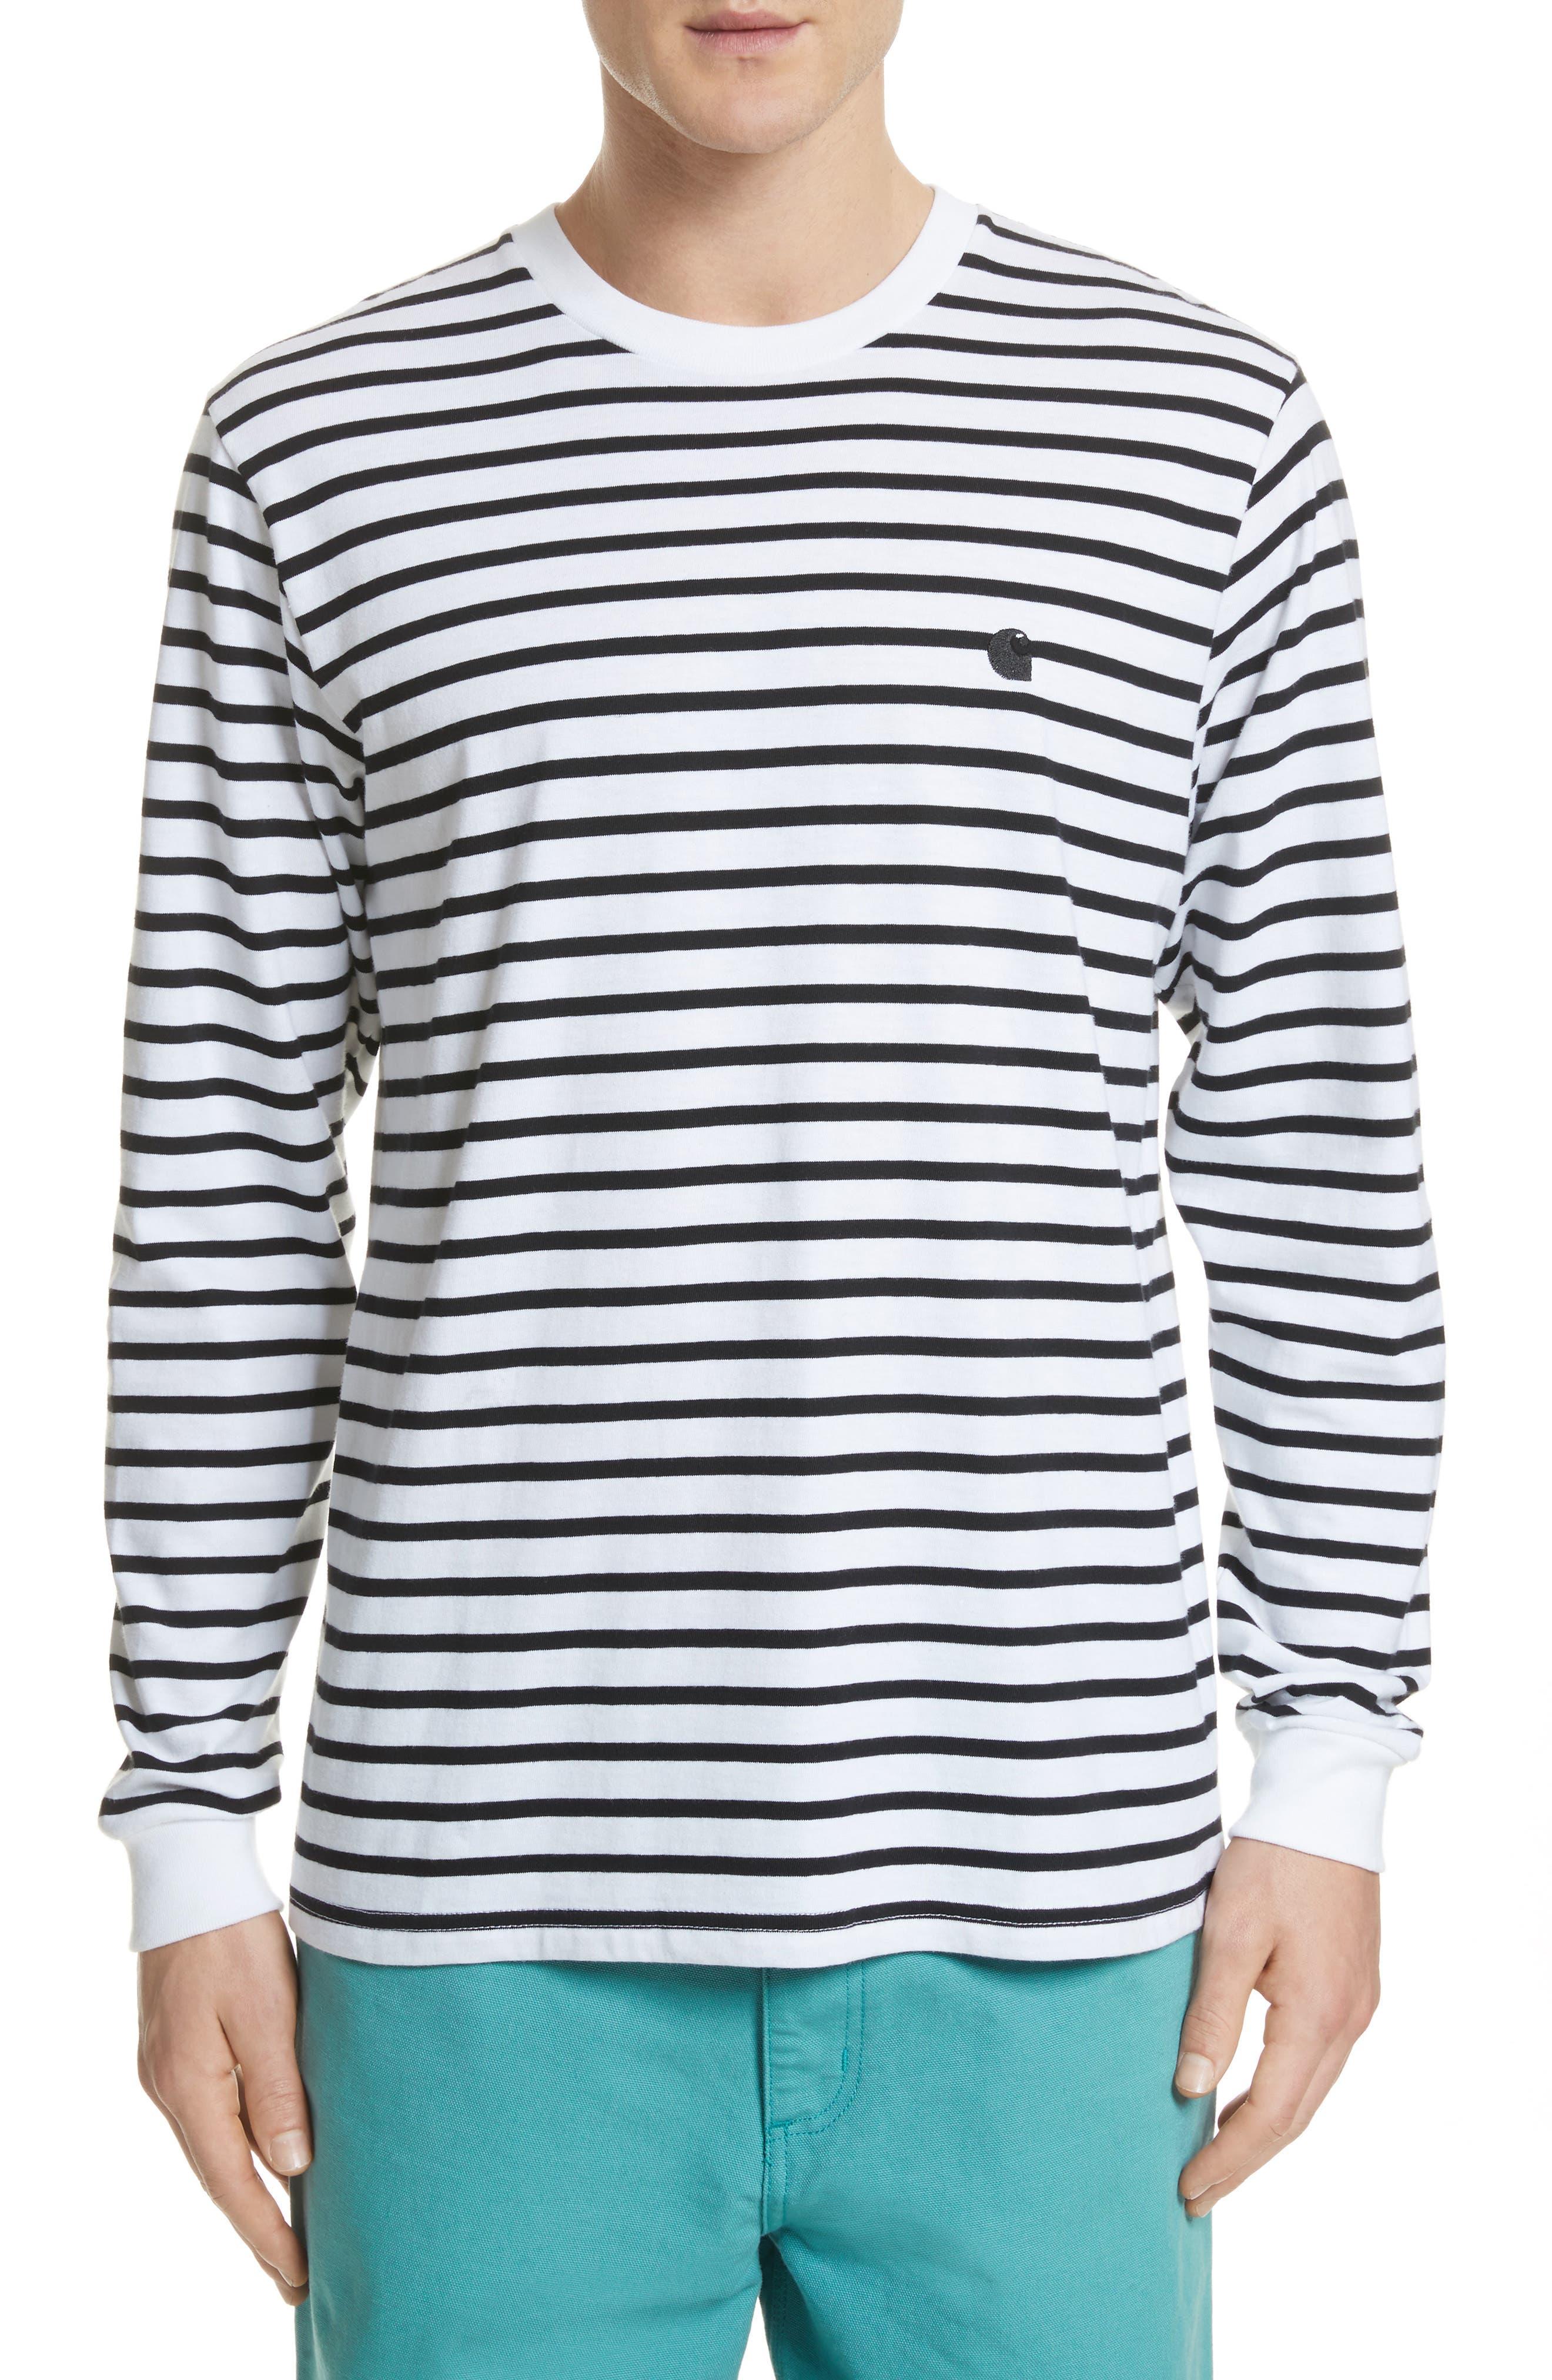 Main Image - Carhartt Work in Progress Stripe Long Sleeve T-Shirt